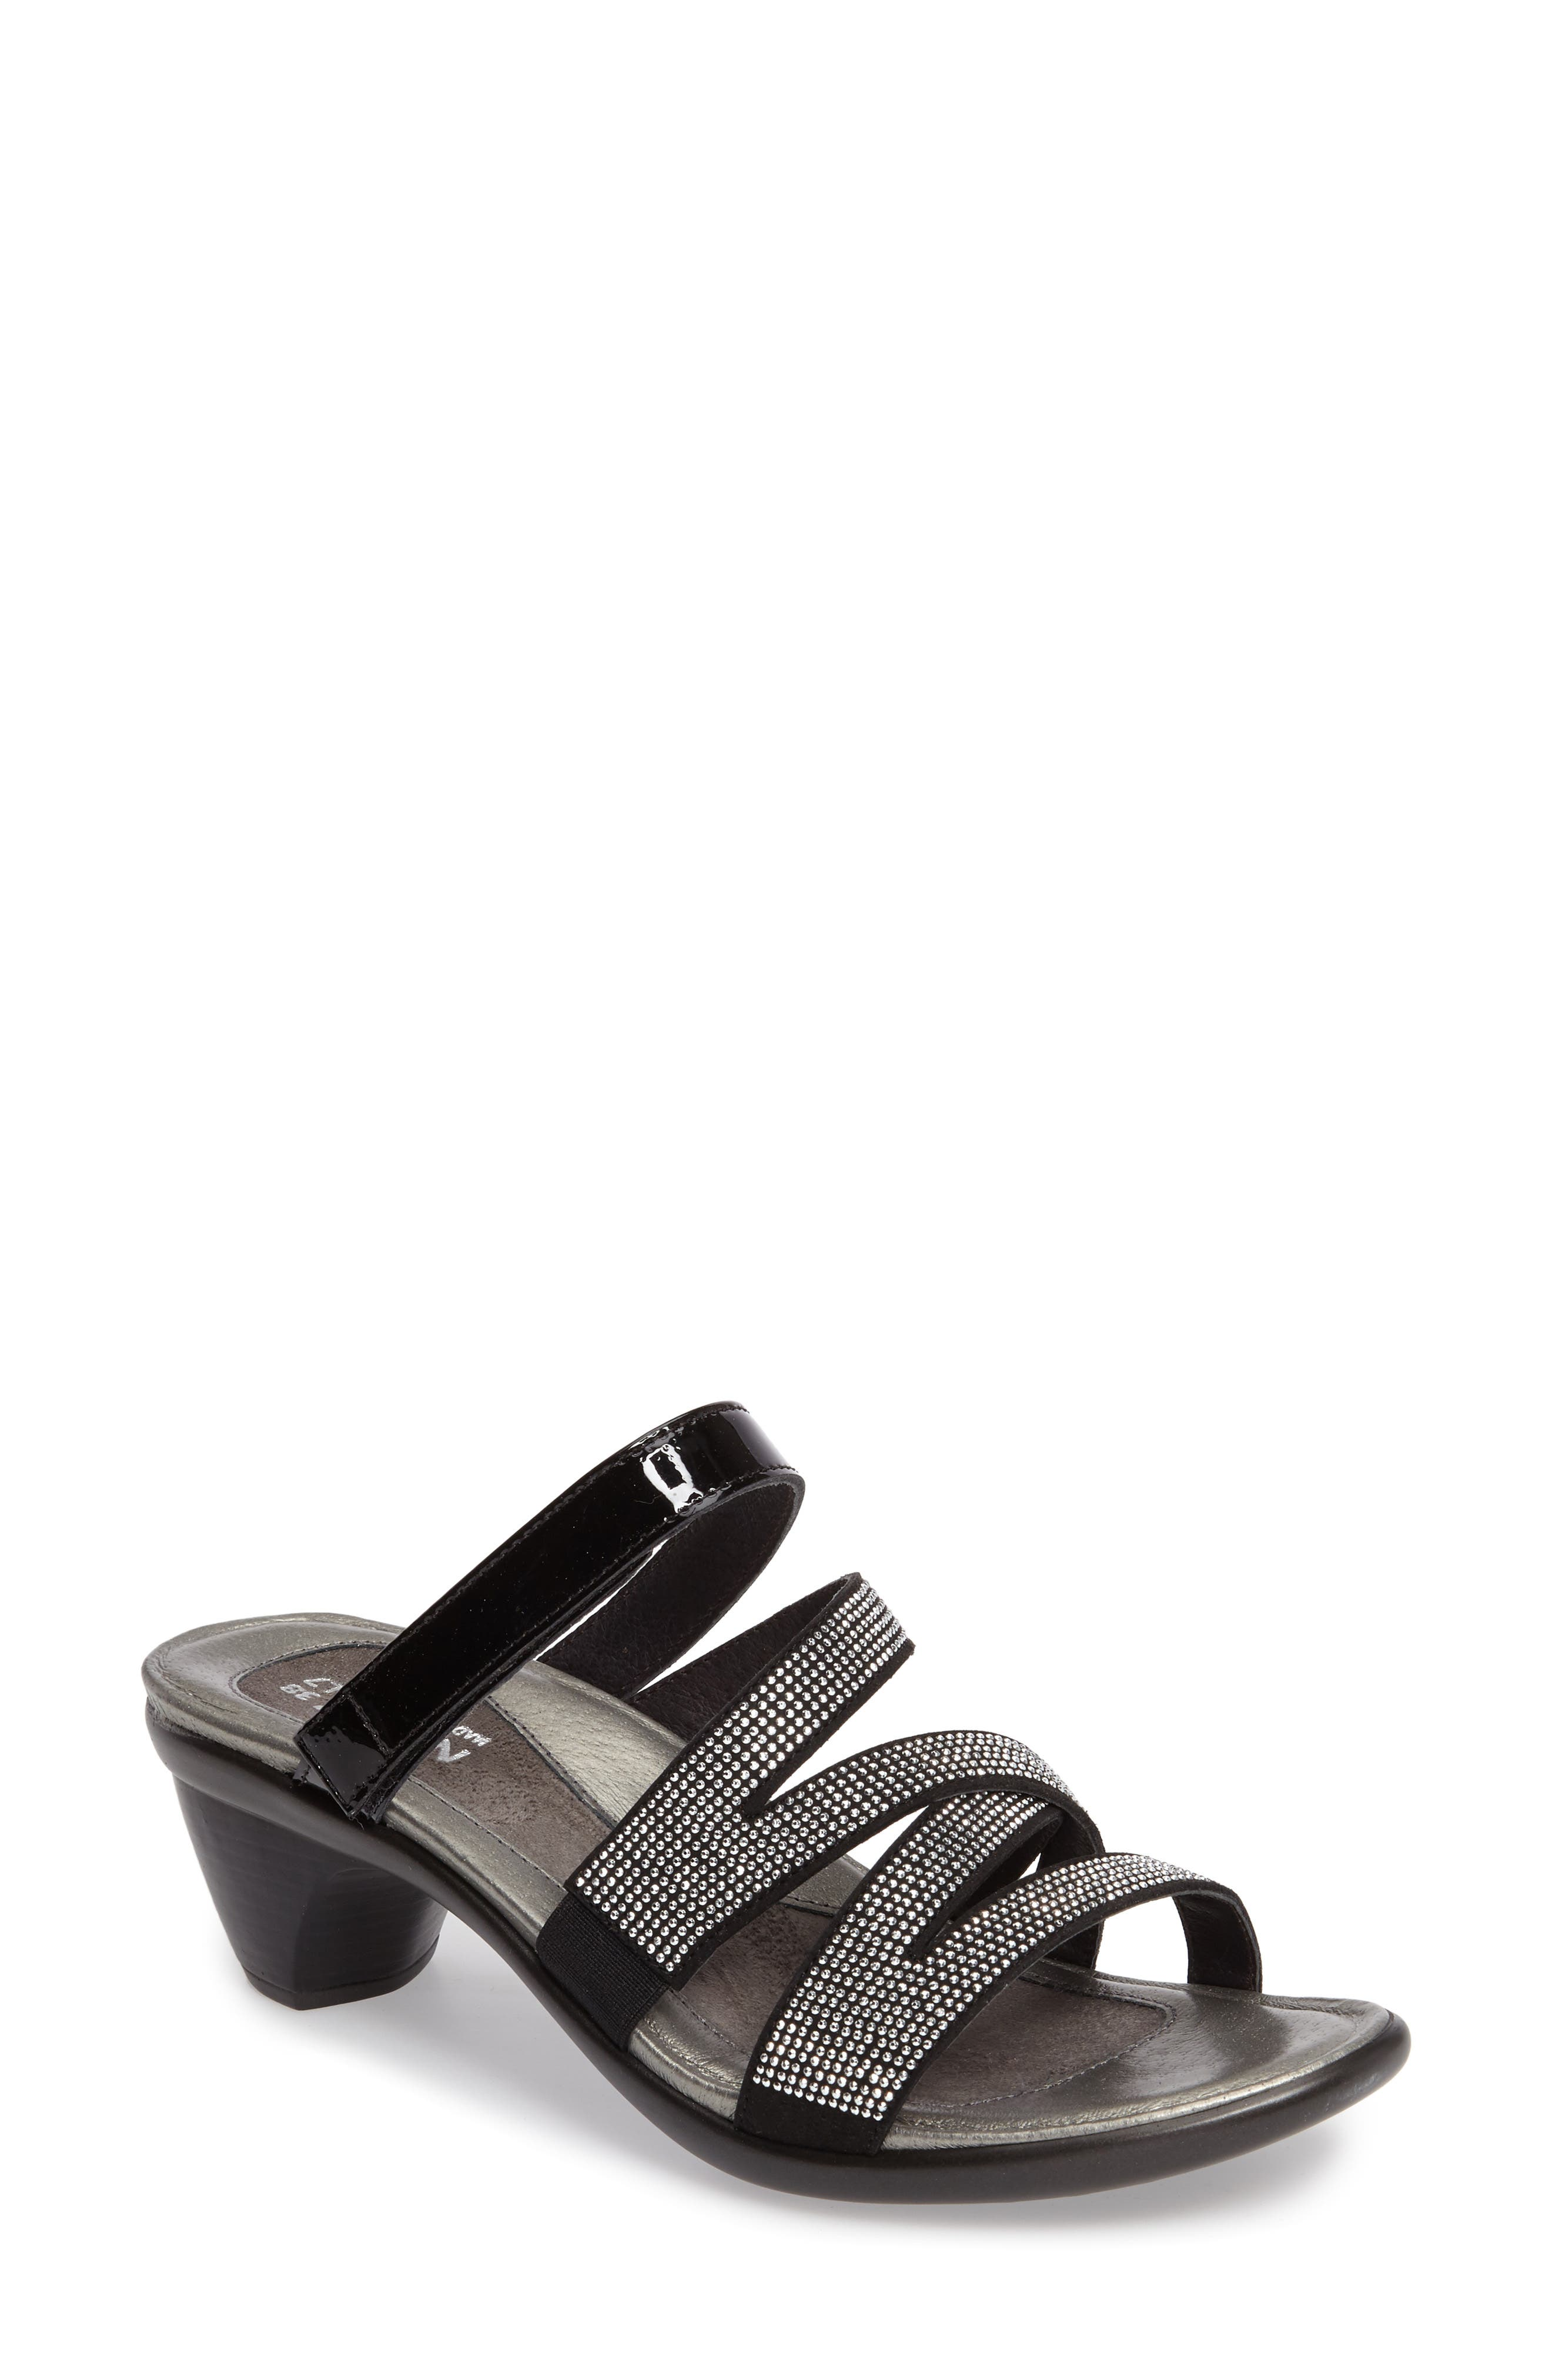 NAOT Formal Sandal